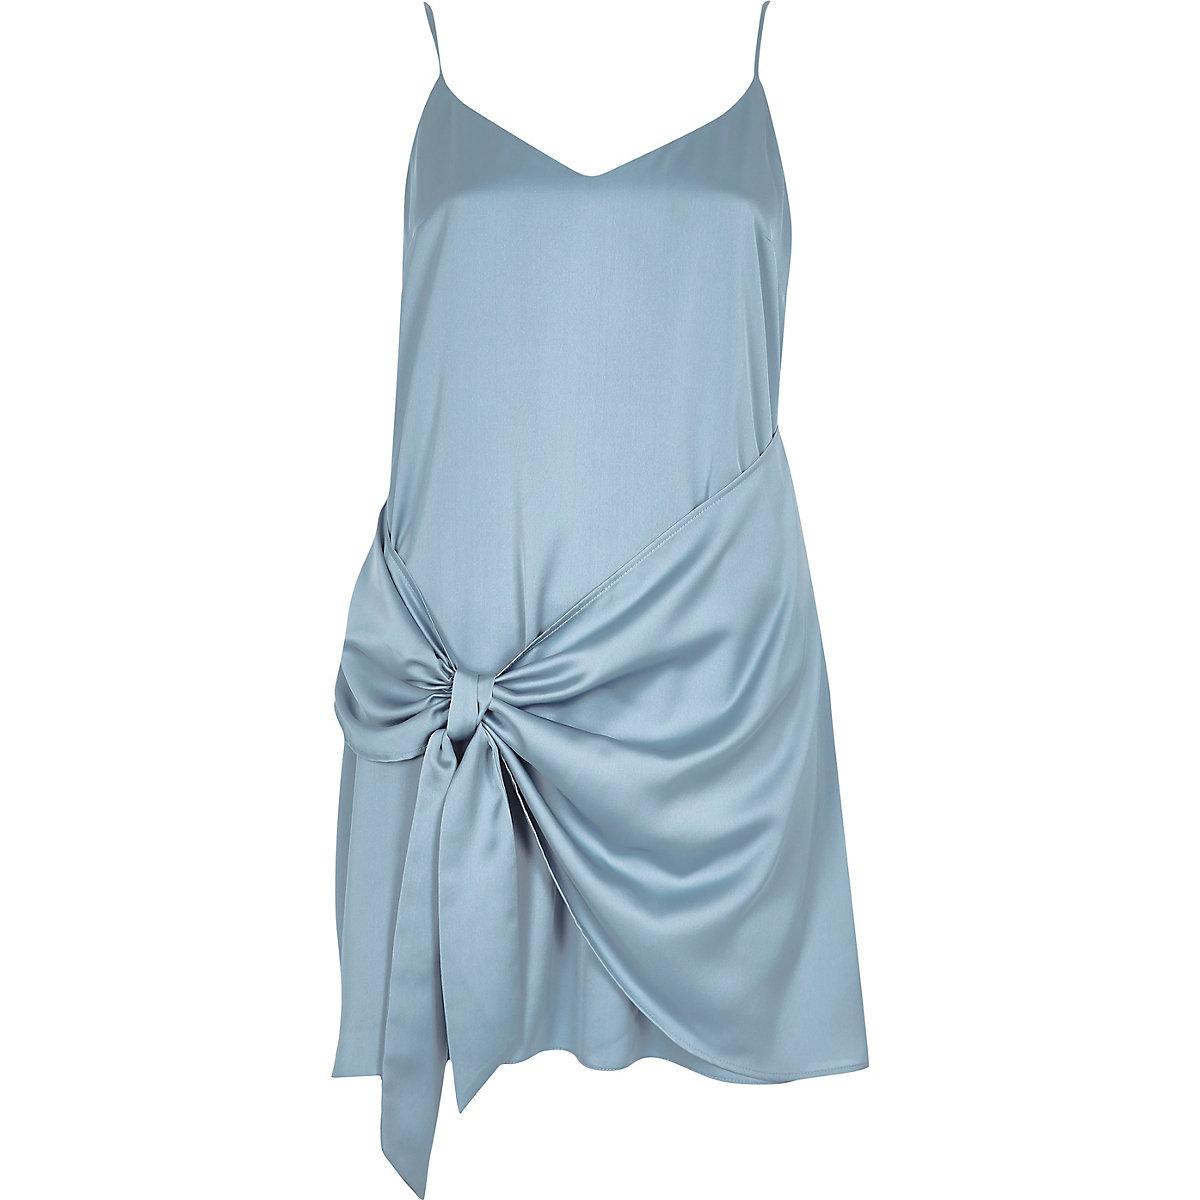 Petite blue tie front cami slip dress